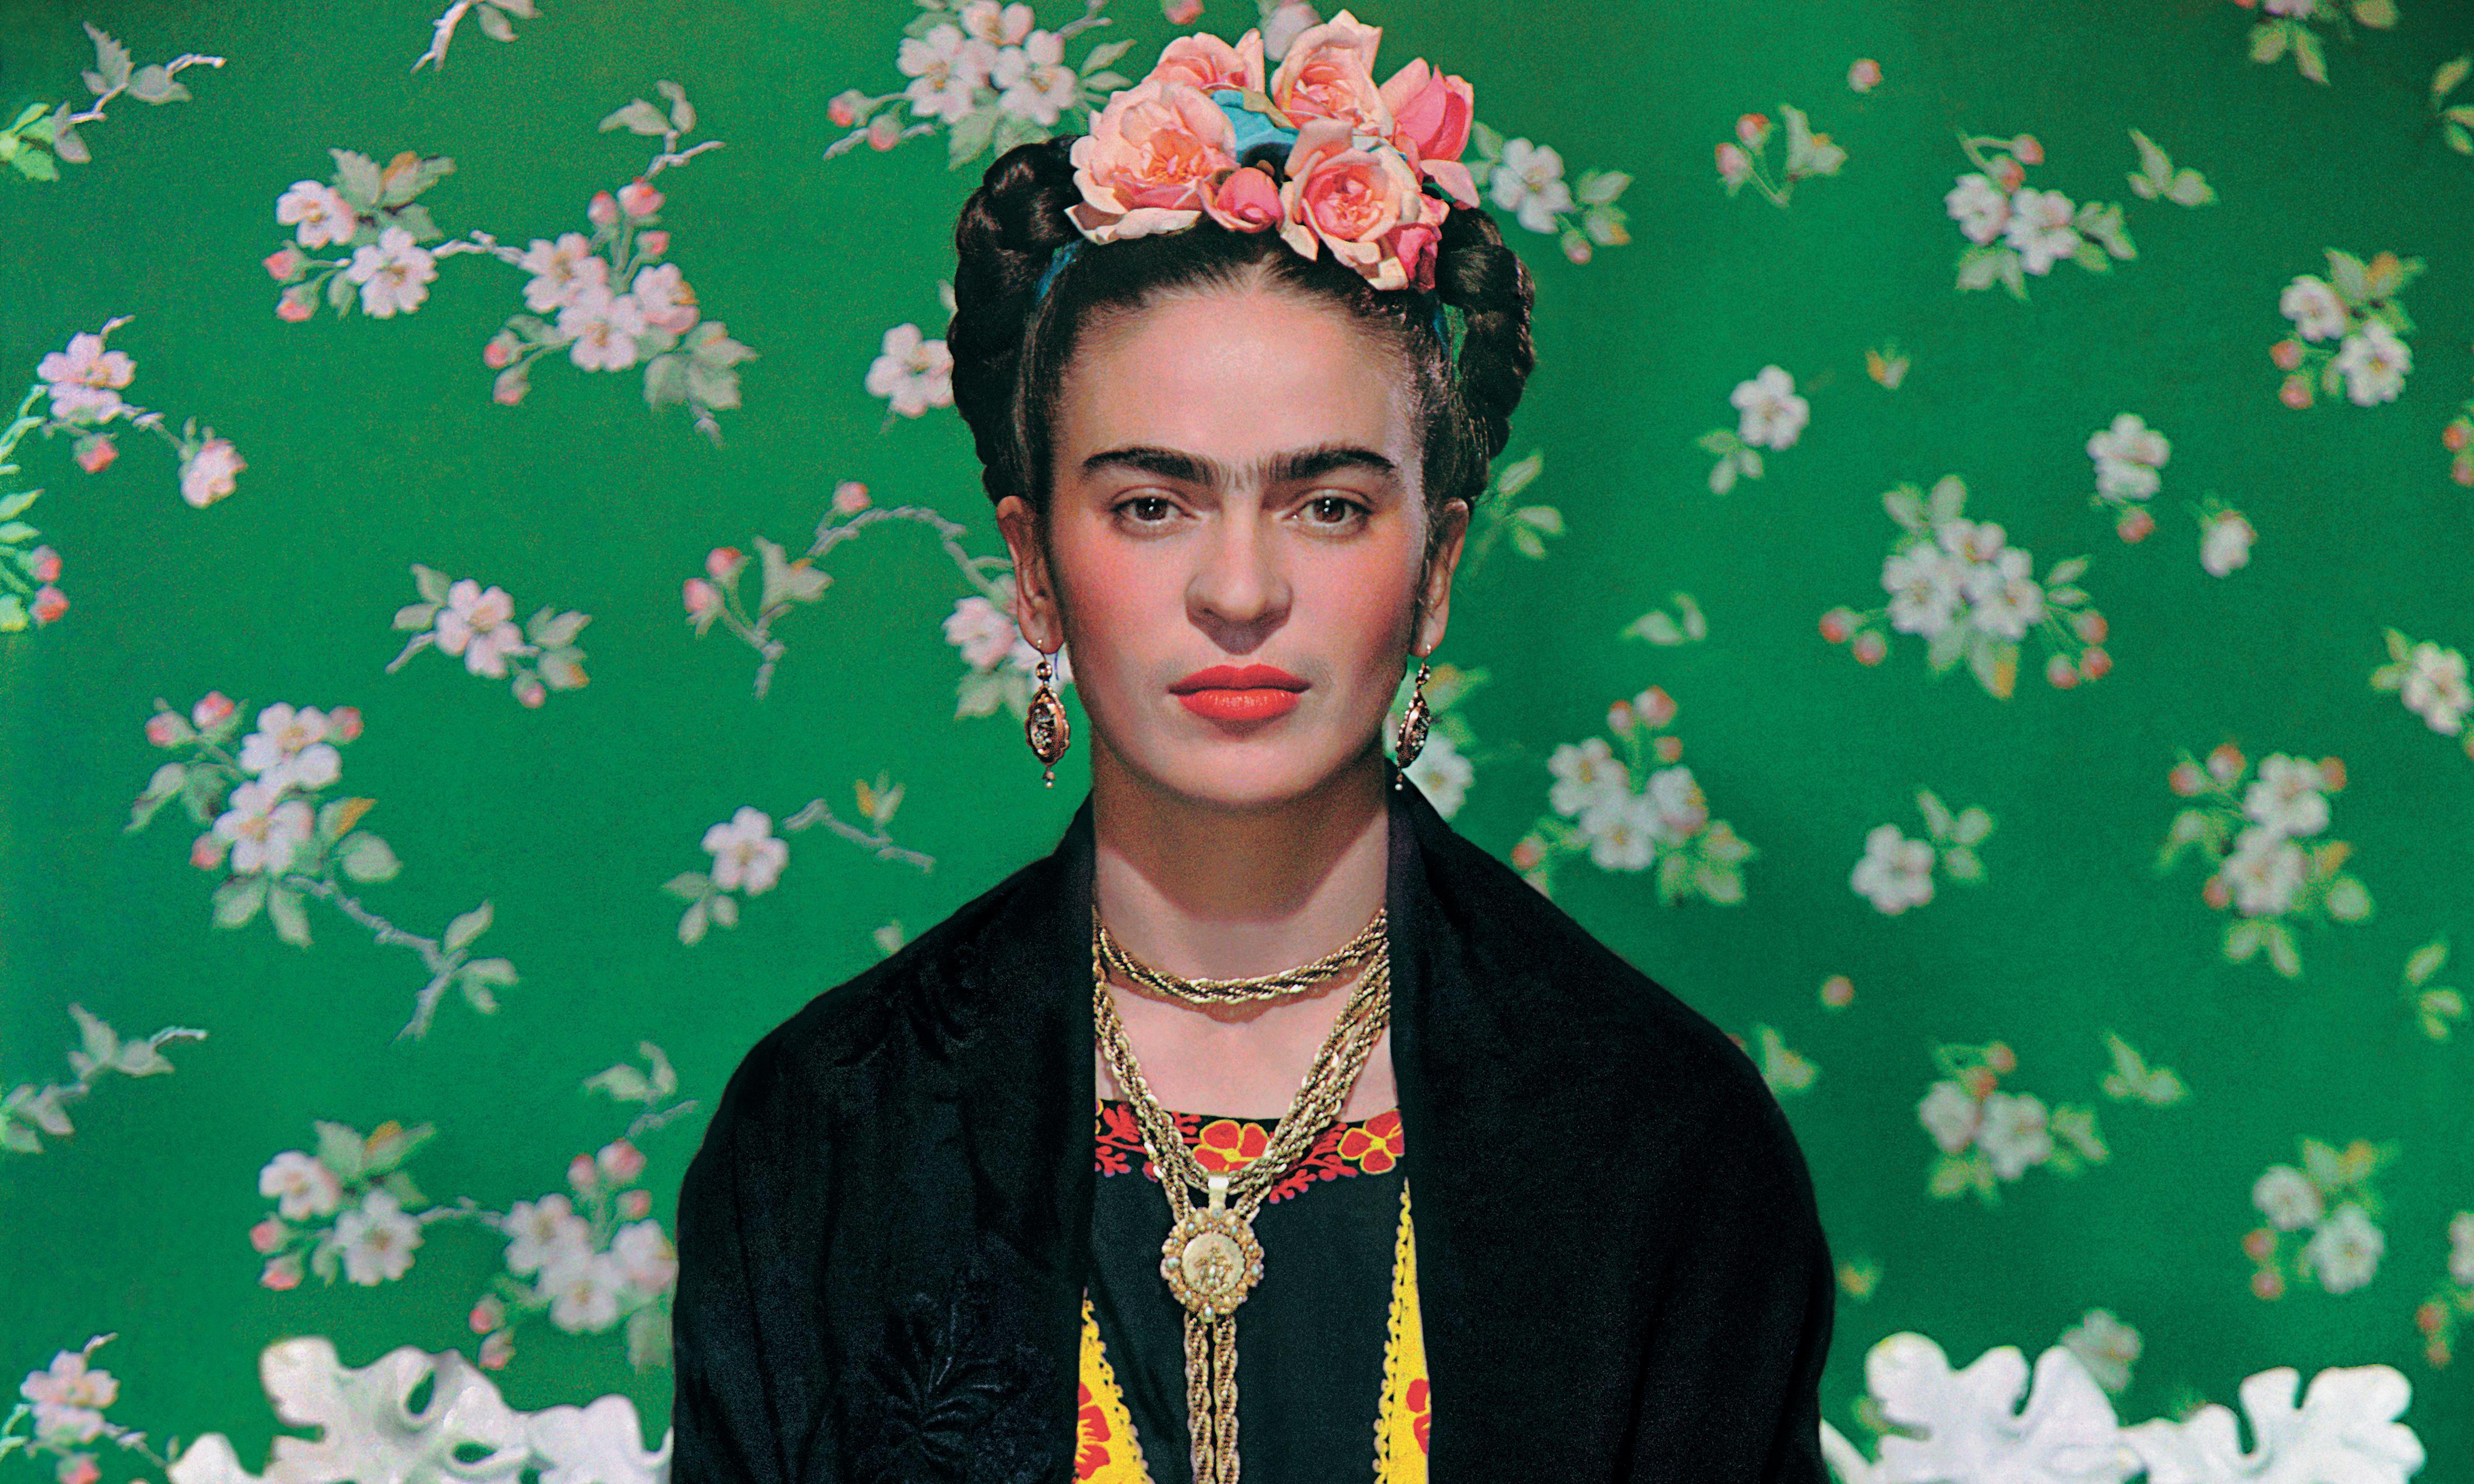 Frida Kahlo's intimate belongings go on display at the V&A